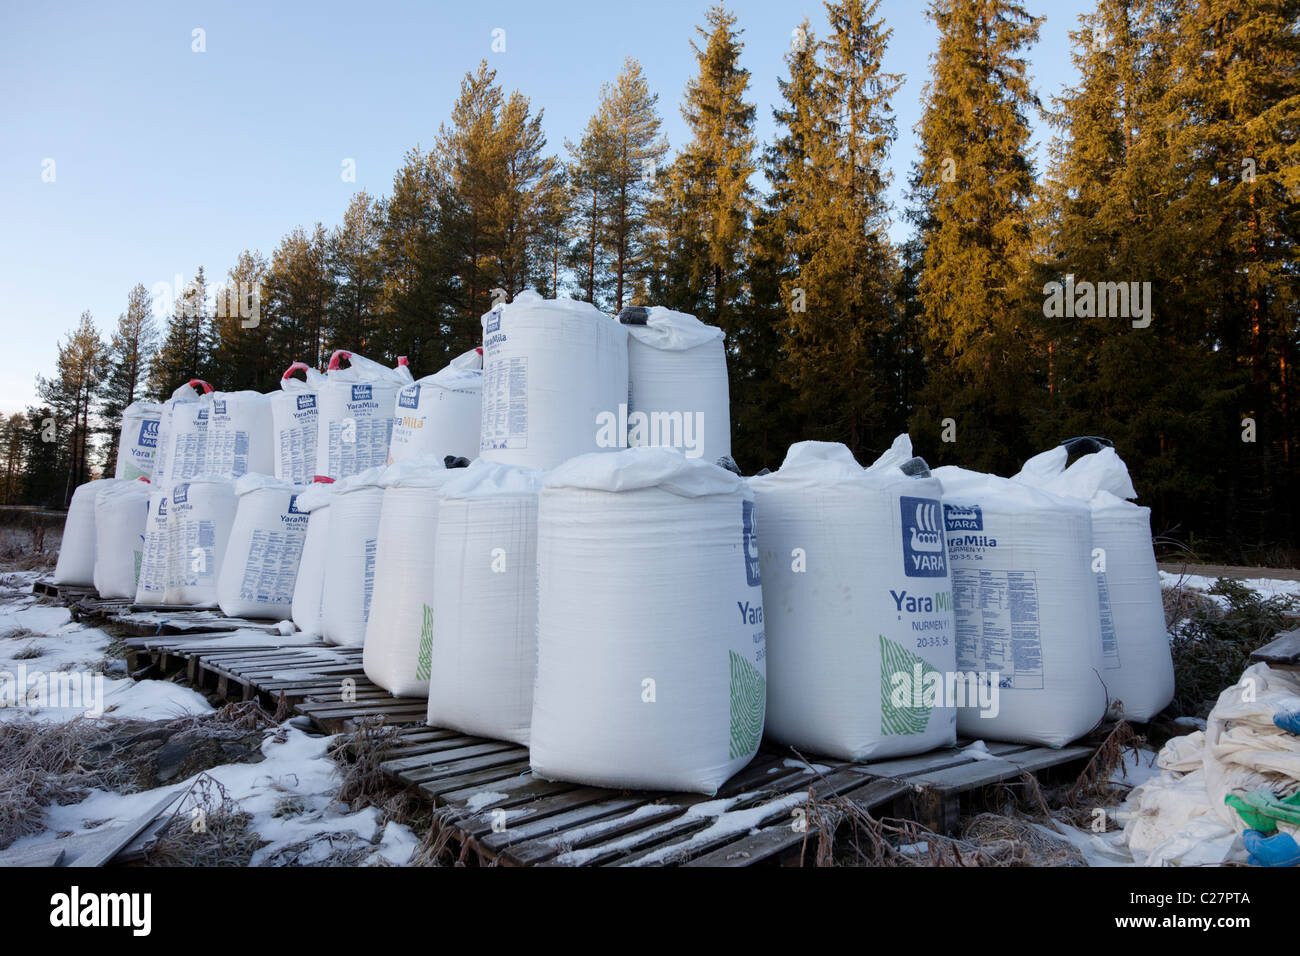 Pile of 650 kilogram NPK fertilizer ( Yara Mila ) sacks for agricultural use , fertilizing grass fields , Finland - Stock Image